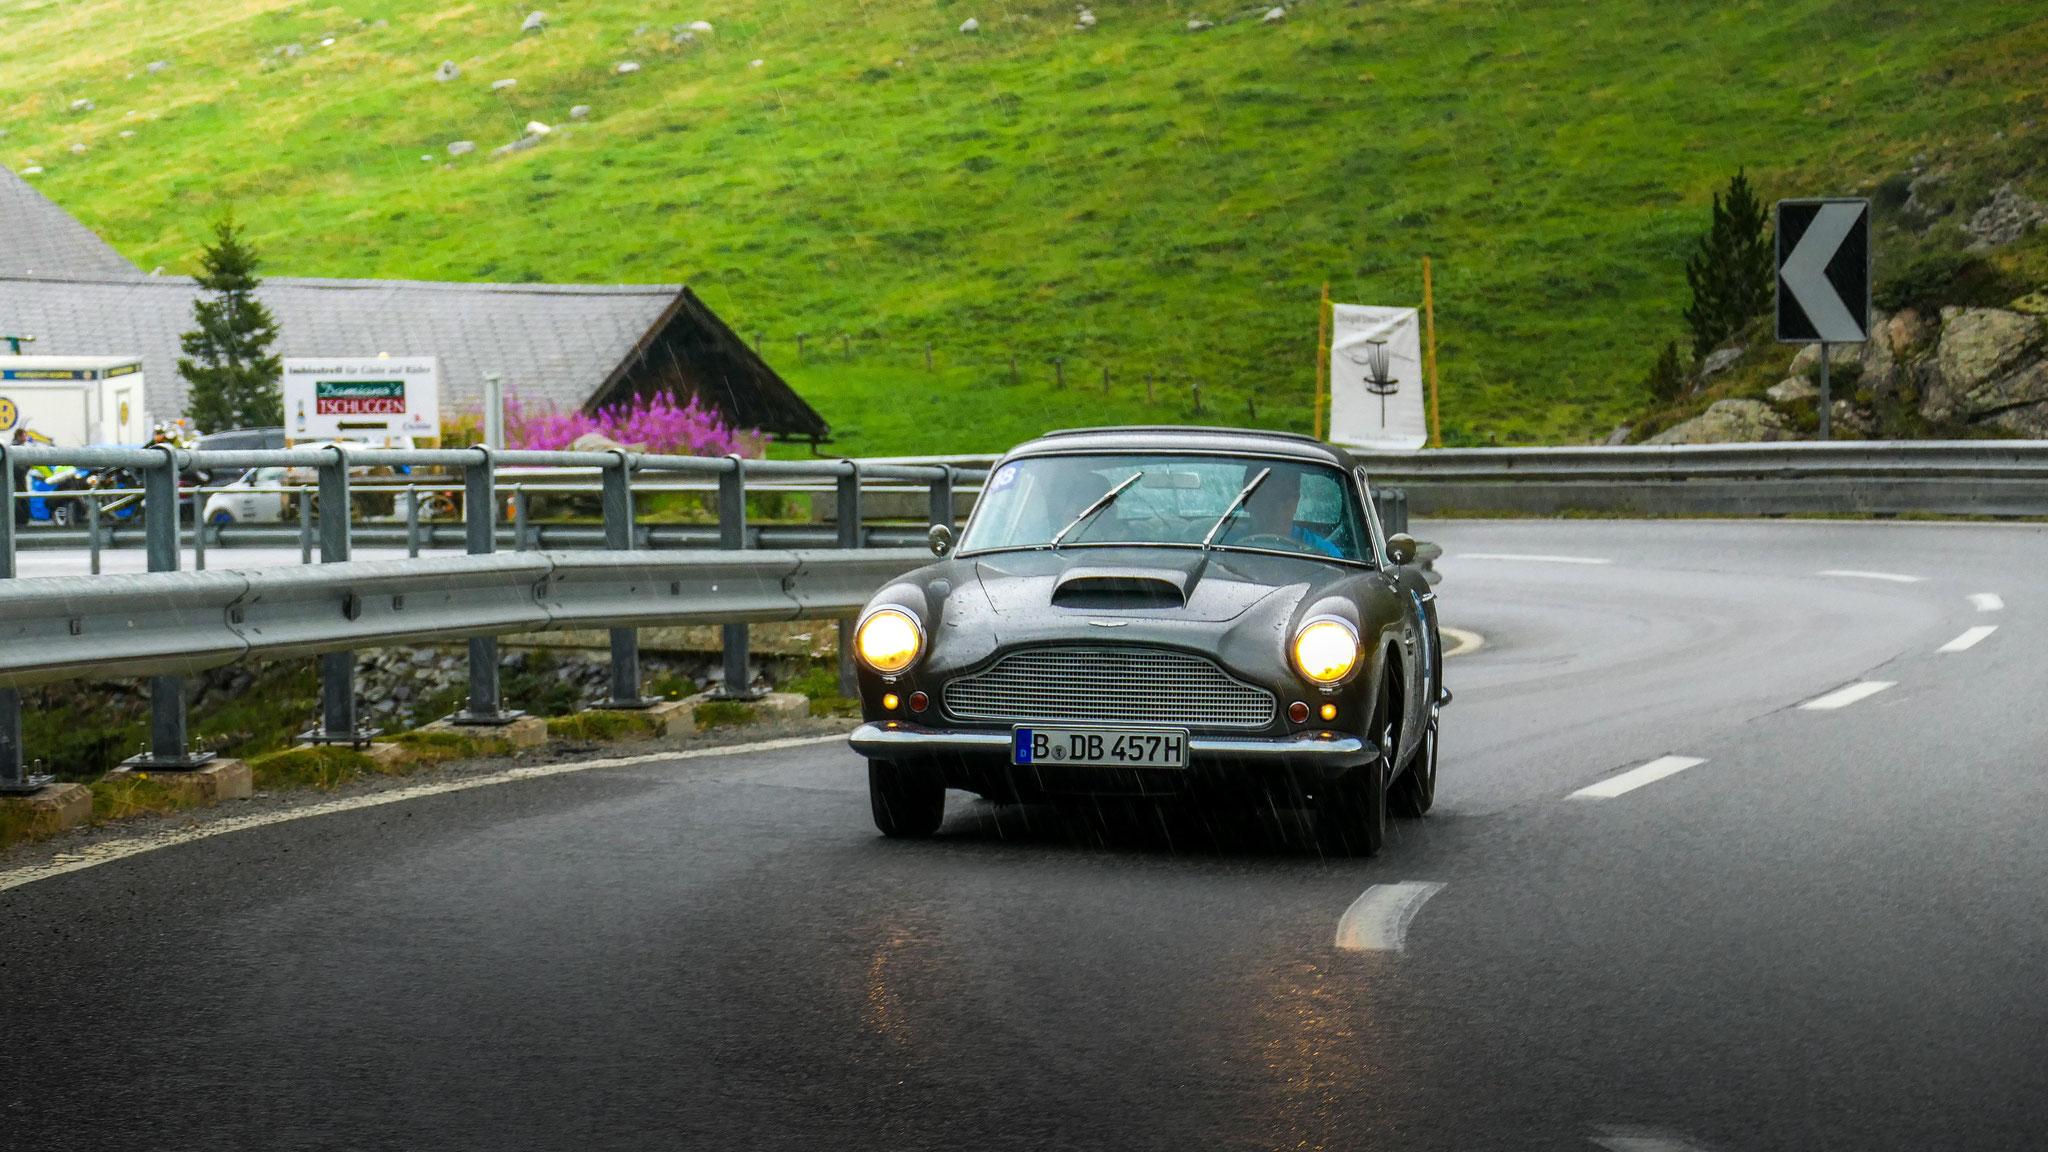 Aston Martin DB4 - B-DB-457H